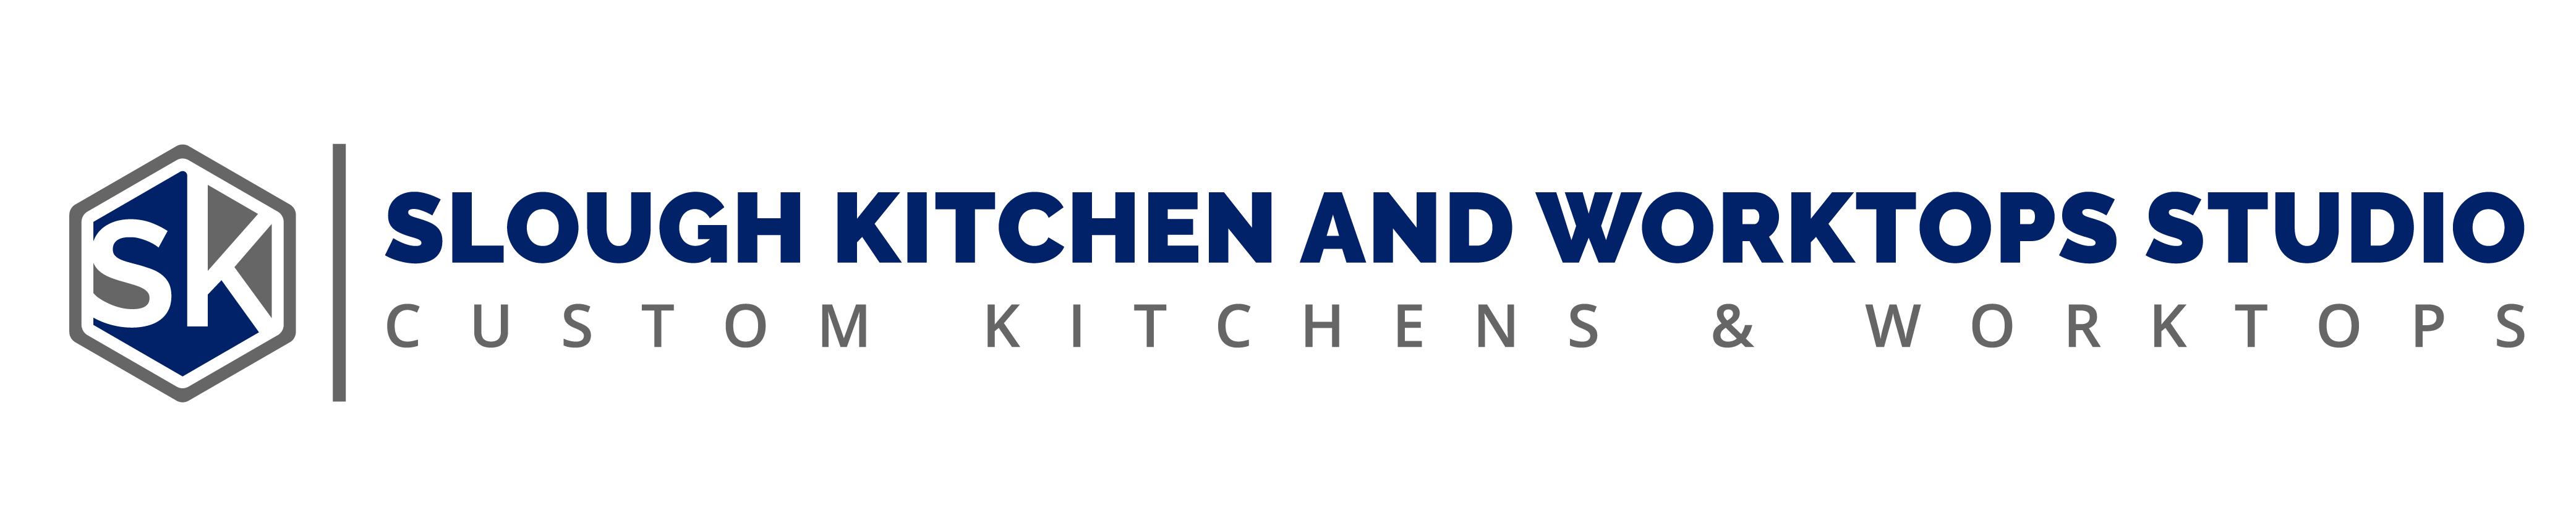 Slough Kitchens